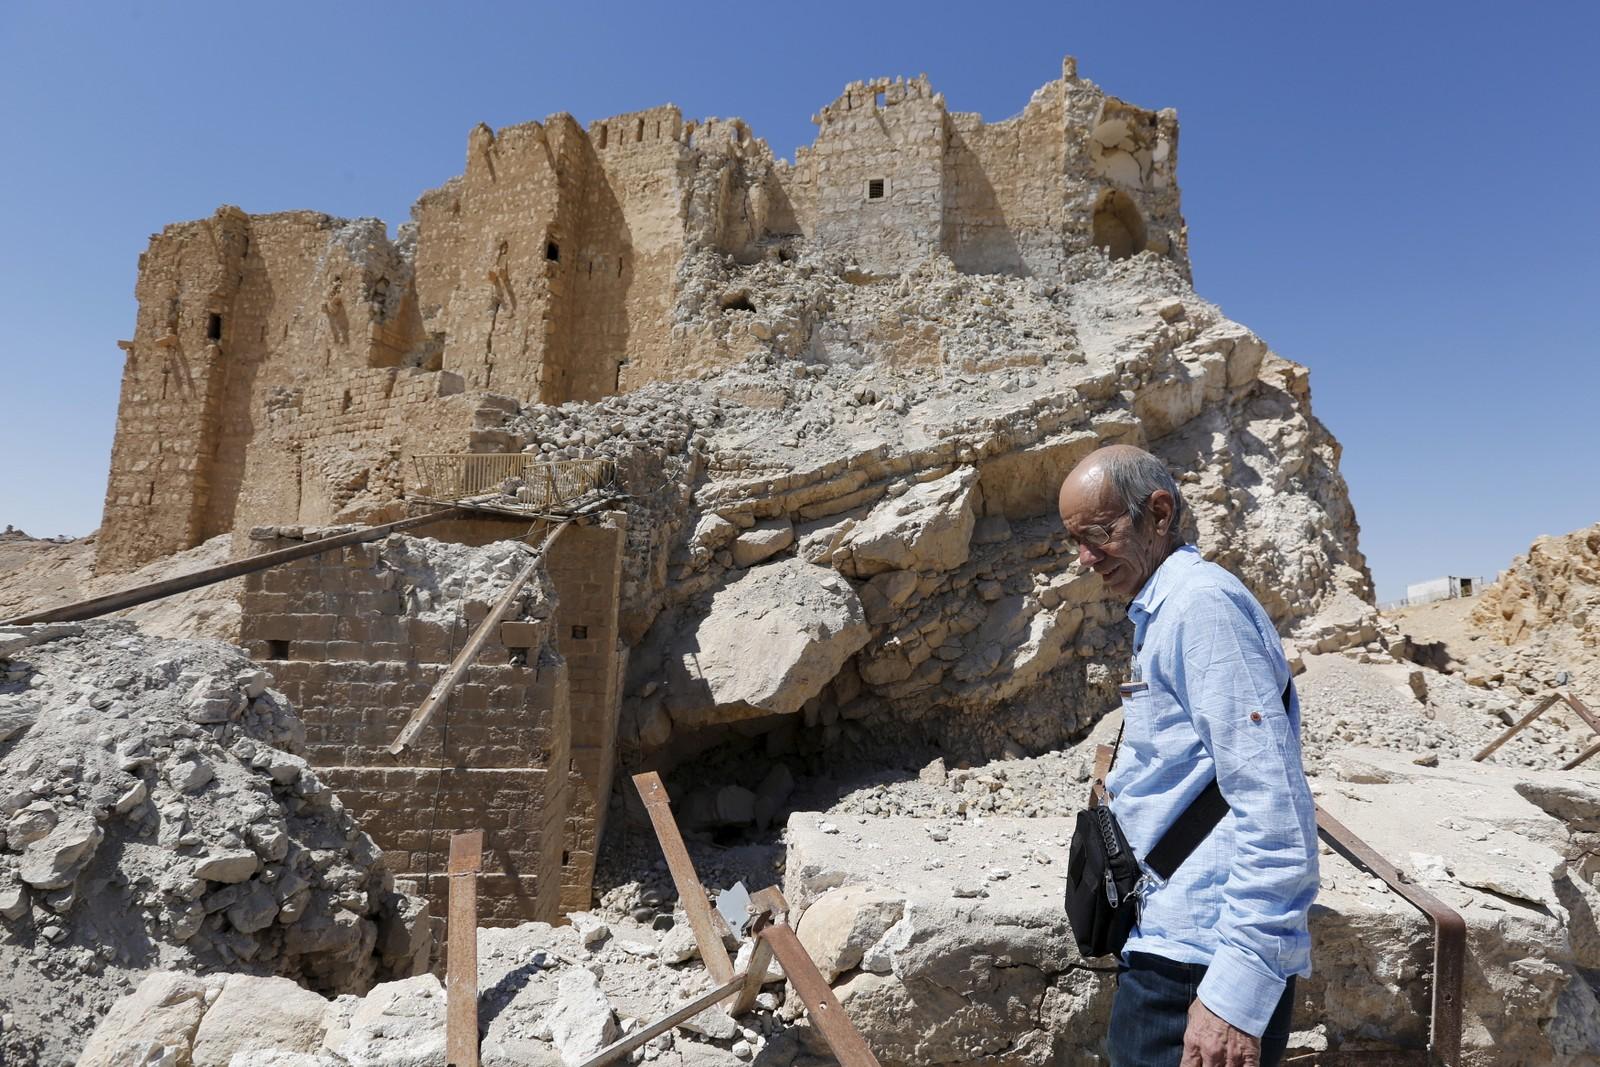 En journalist går foran Fakhreddin slott i den historiske byen.